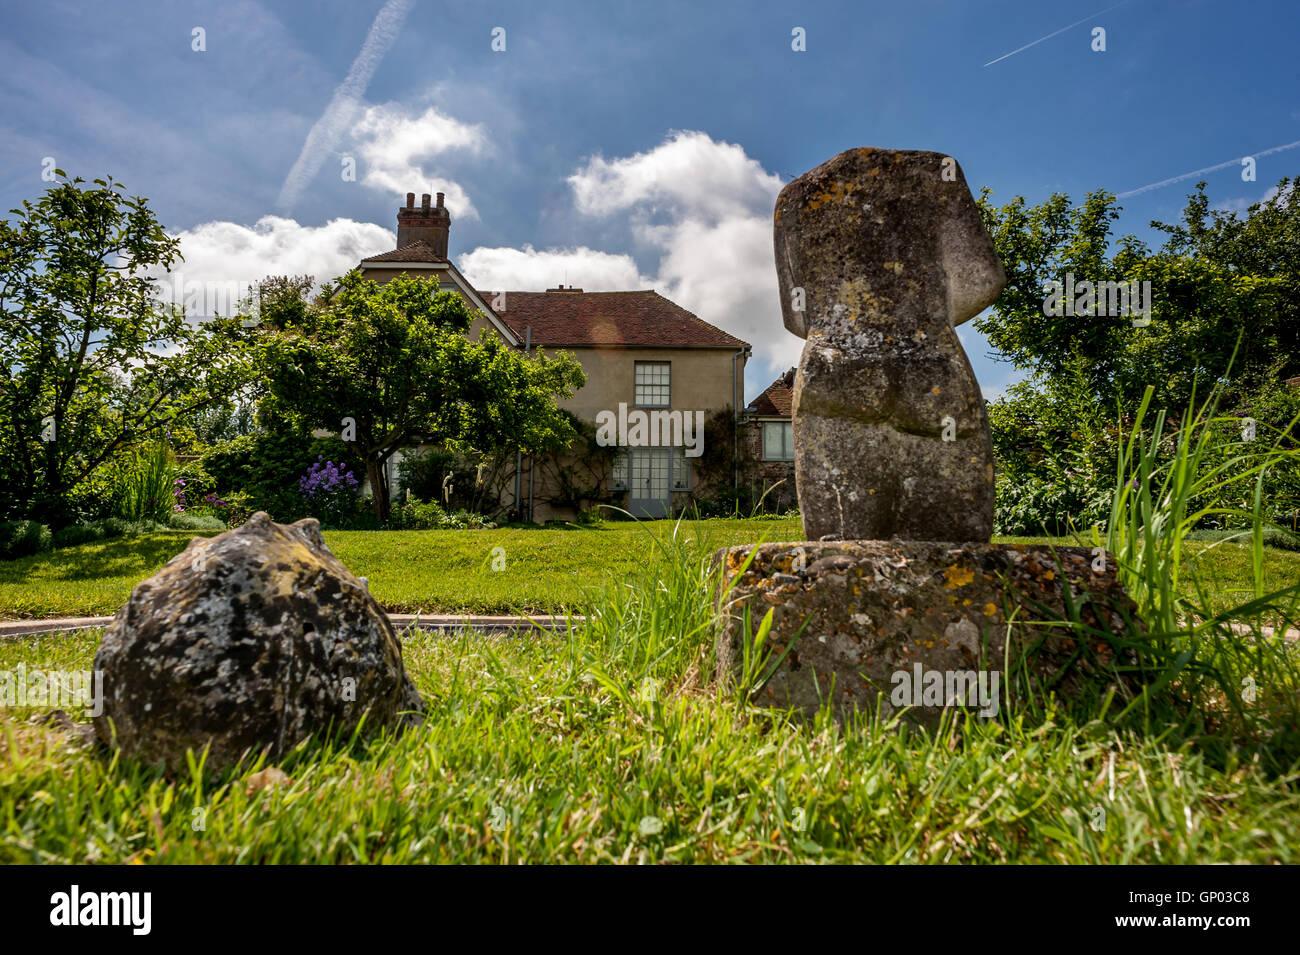 Charleston Farmhouse, die Heimat der Bloomsbury Group in East Sussex. Stockfoto